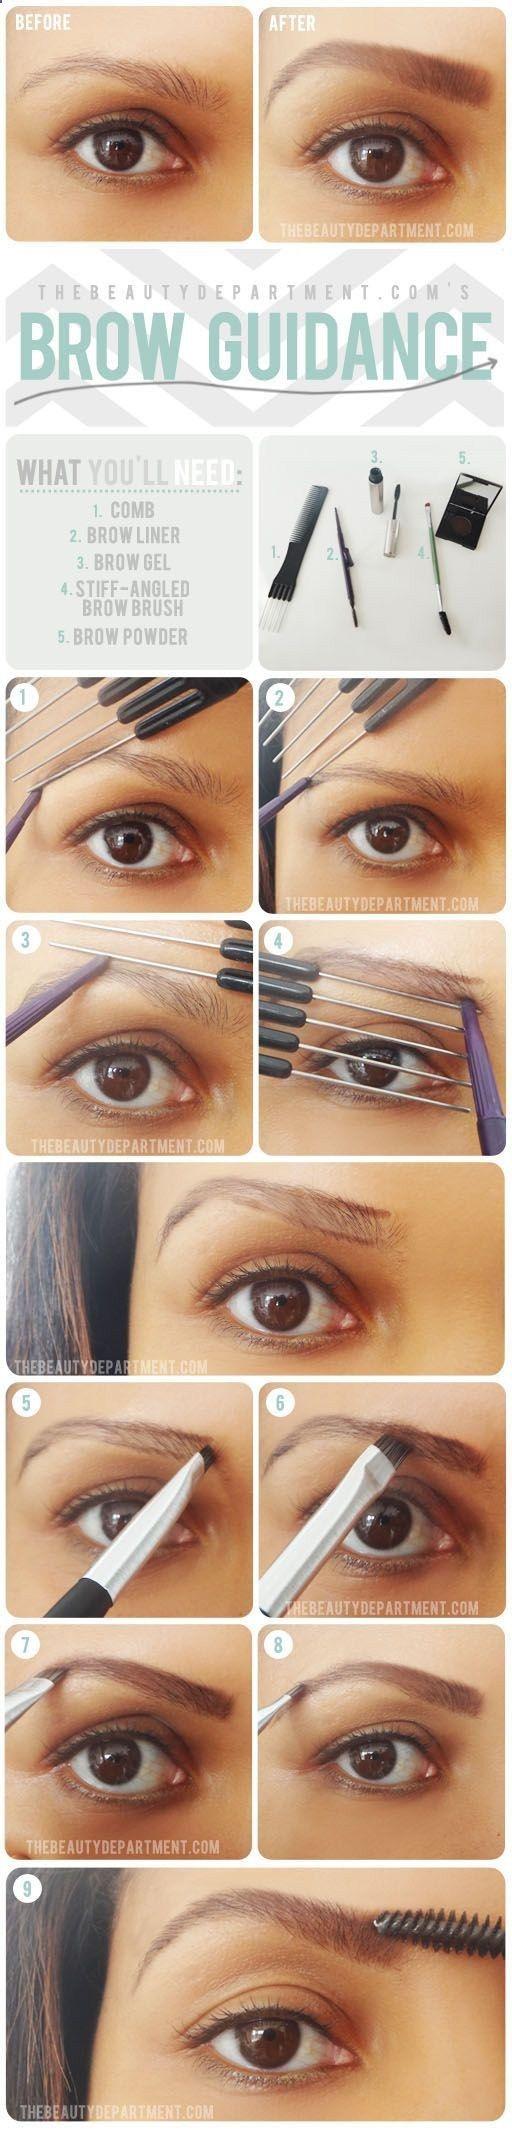 Eye brow penciling